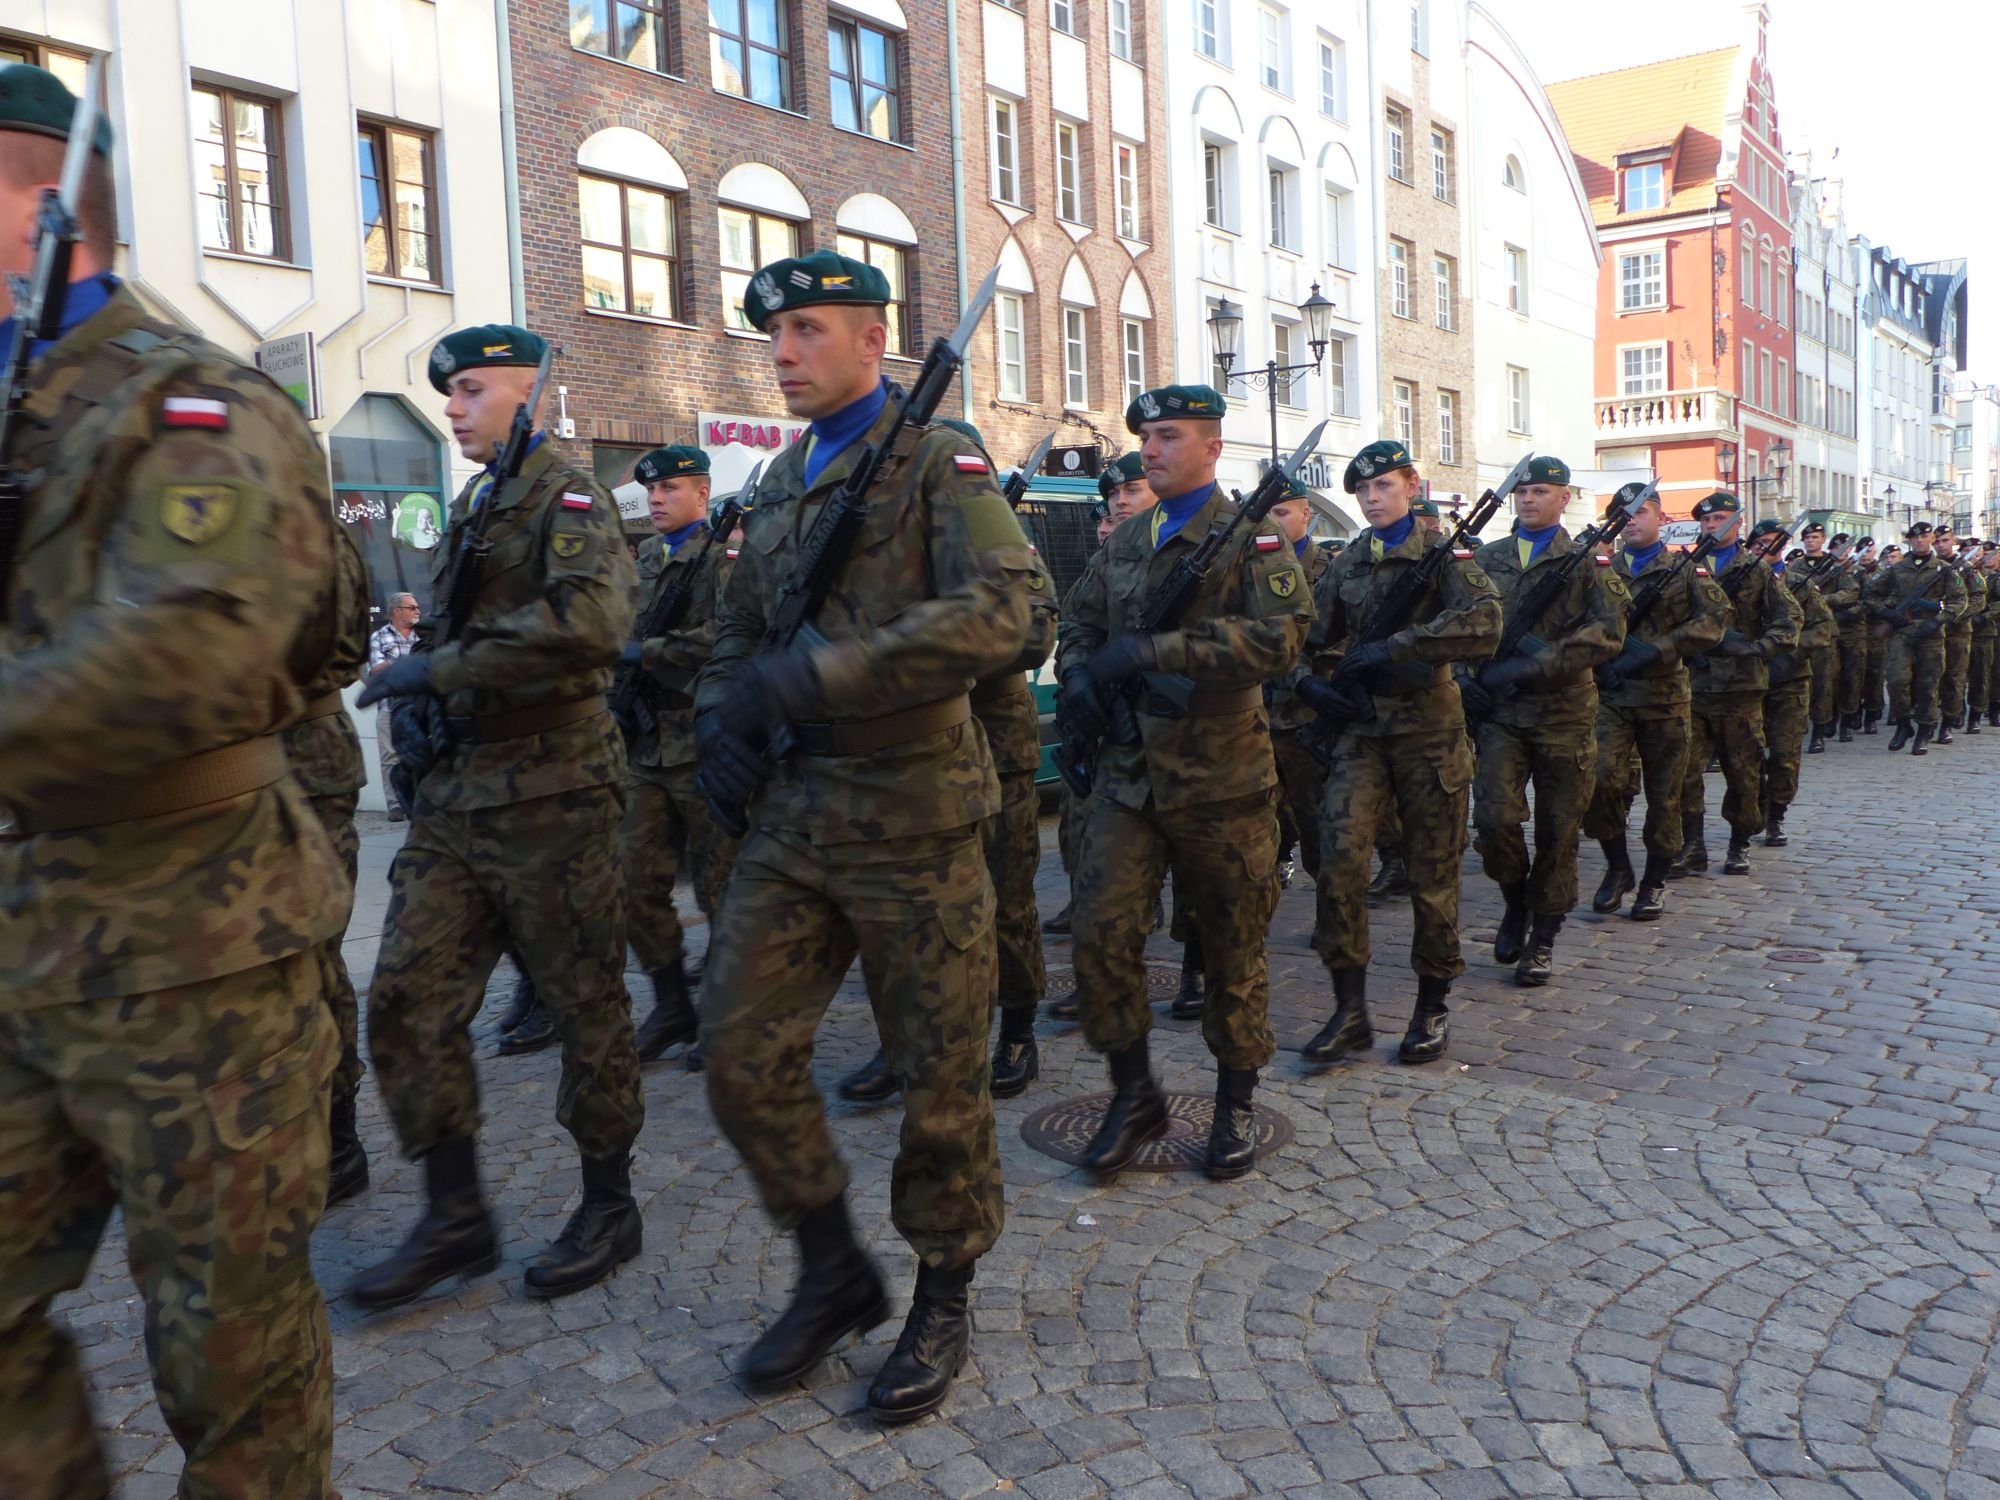 http://m.wm.pl/2016/09/orig/wojsko-na-starowce-335141.jpg